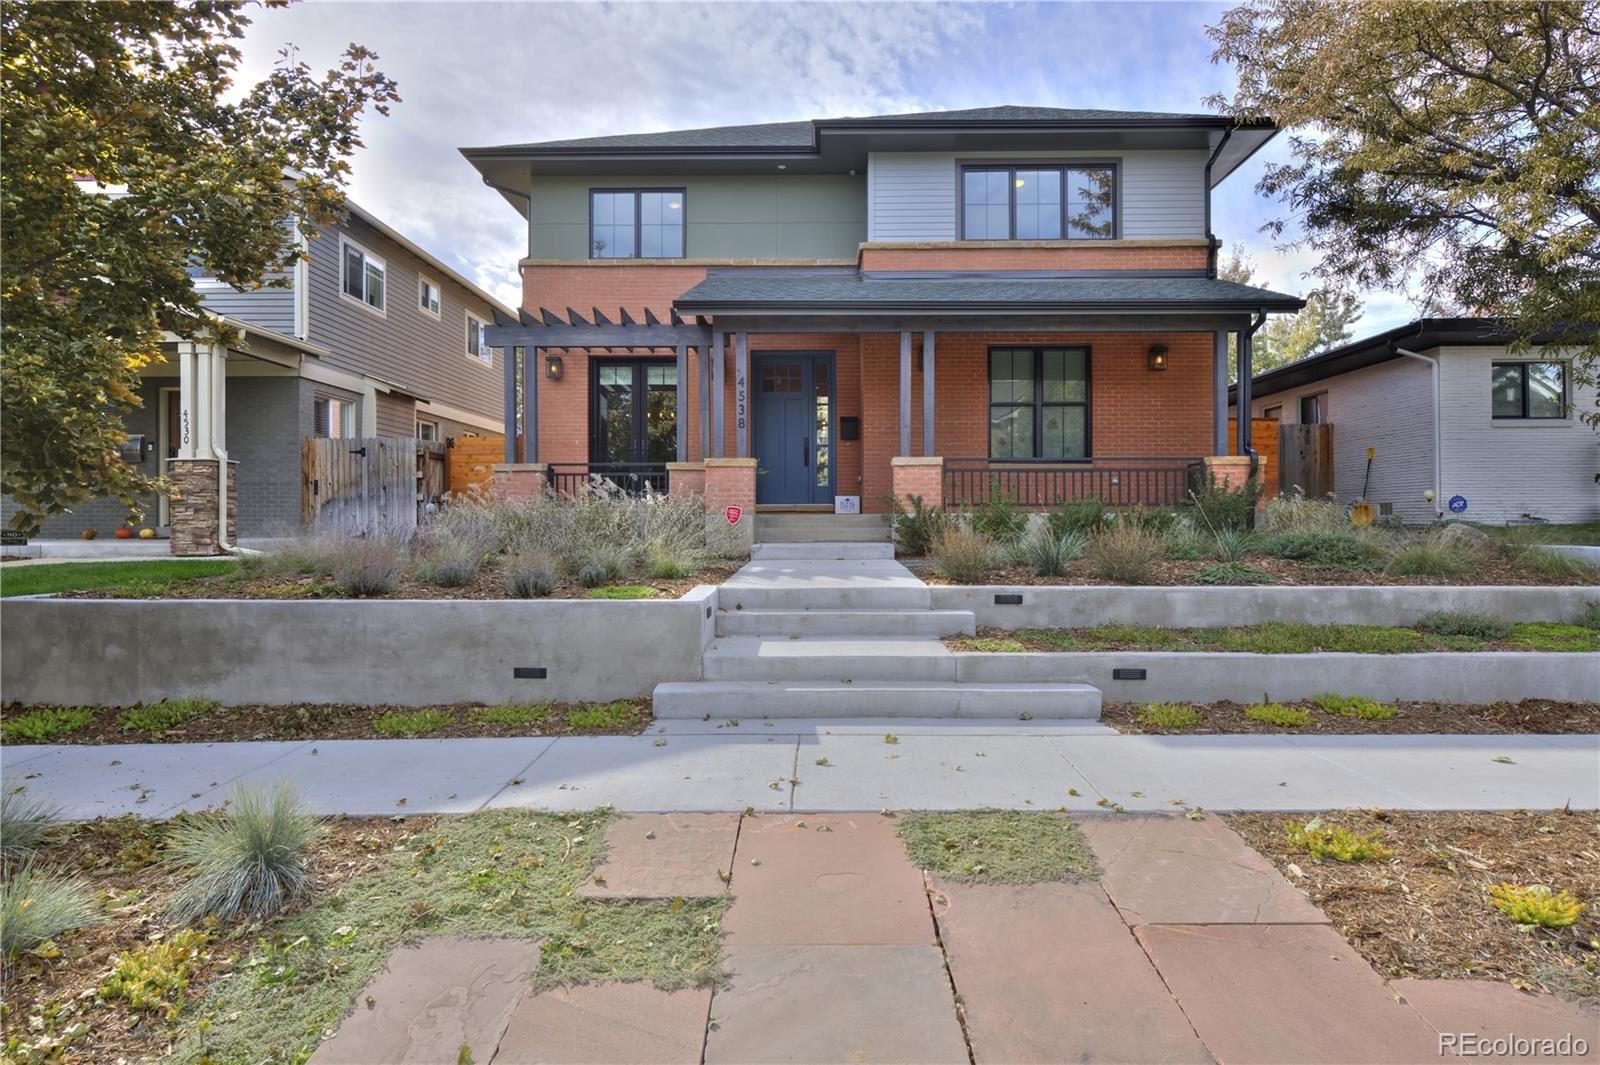 Photo of 4538 W 36th Avenue, Denver, CO 80212 (MLS # 7874476)